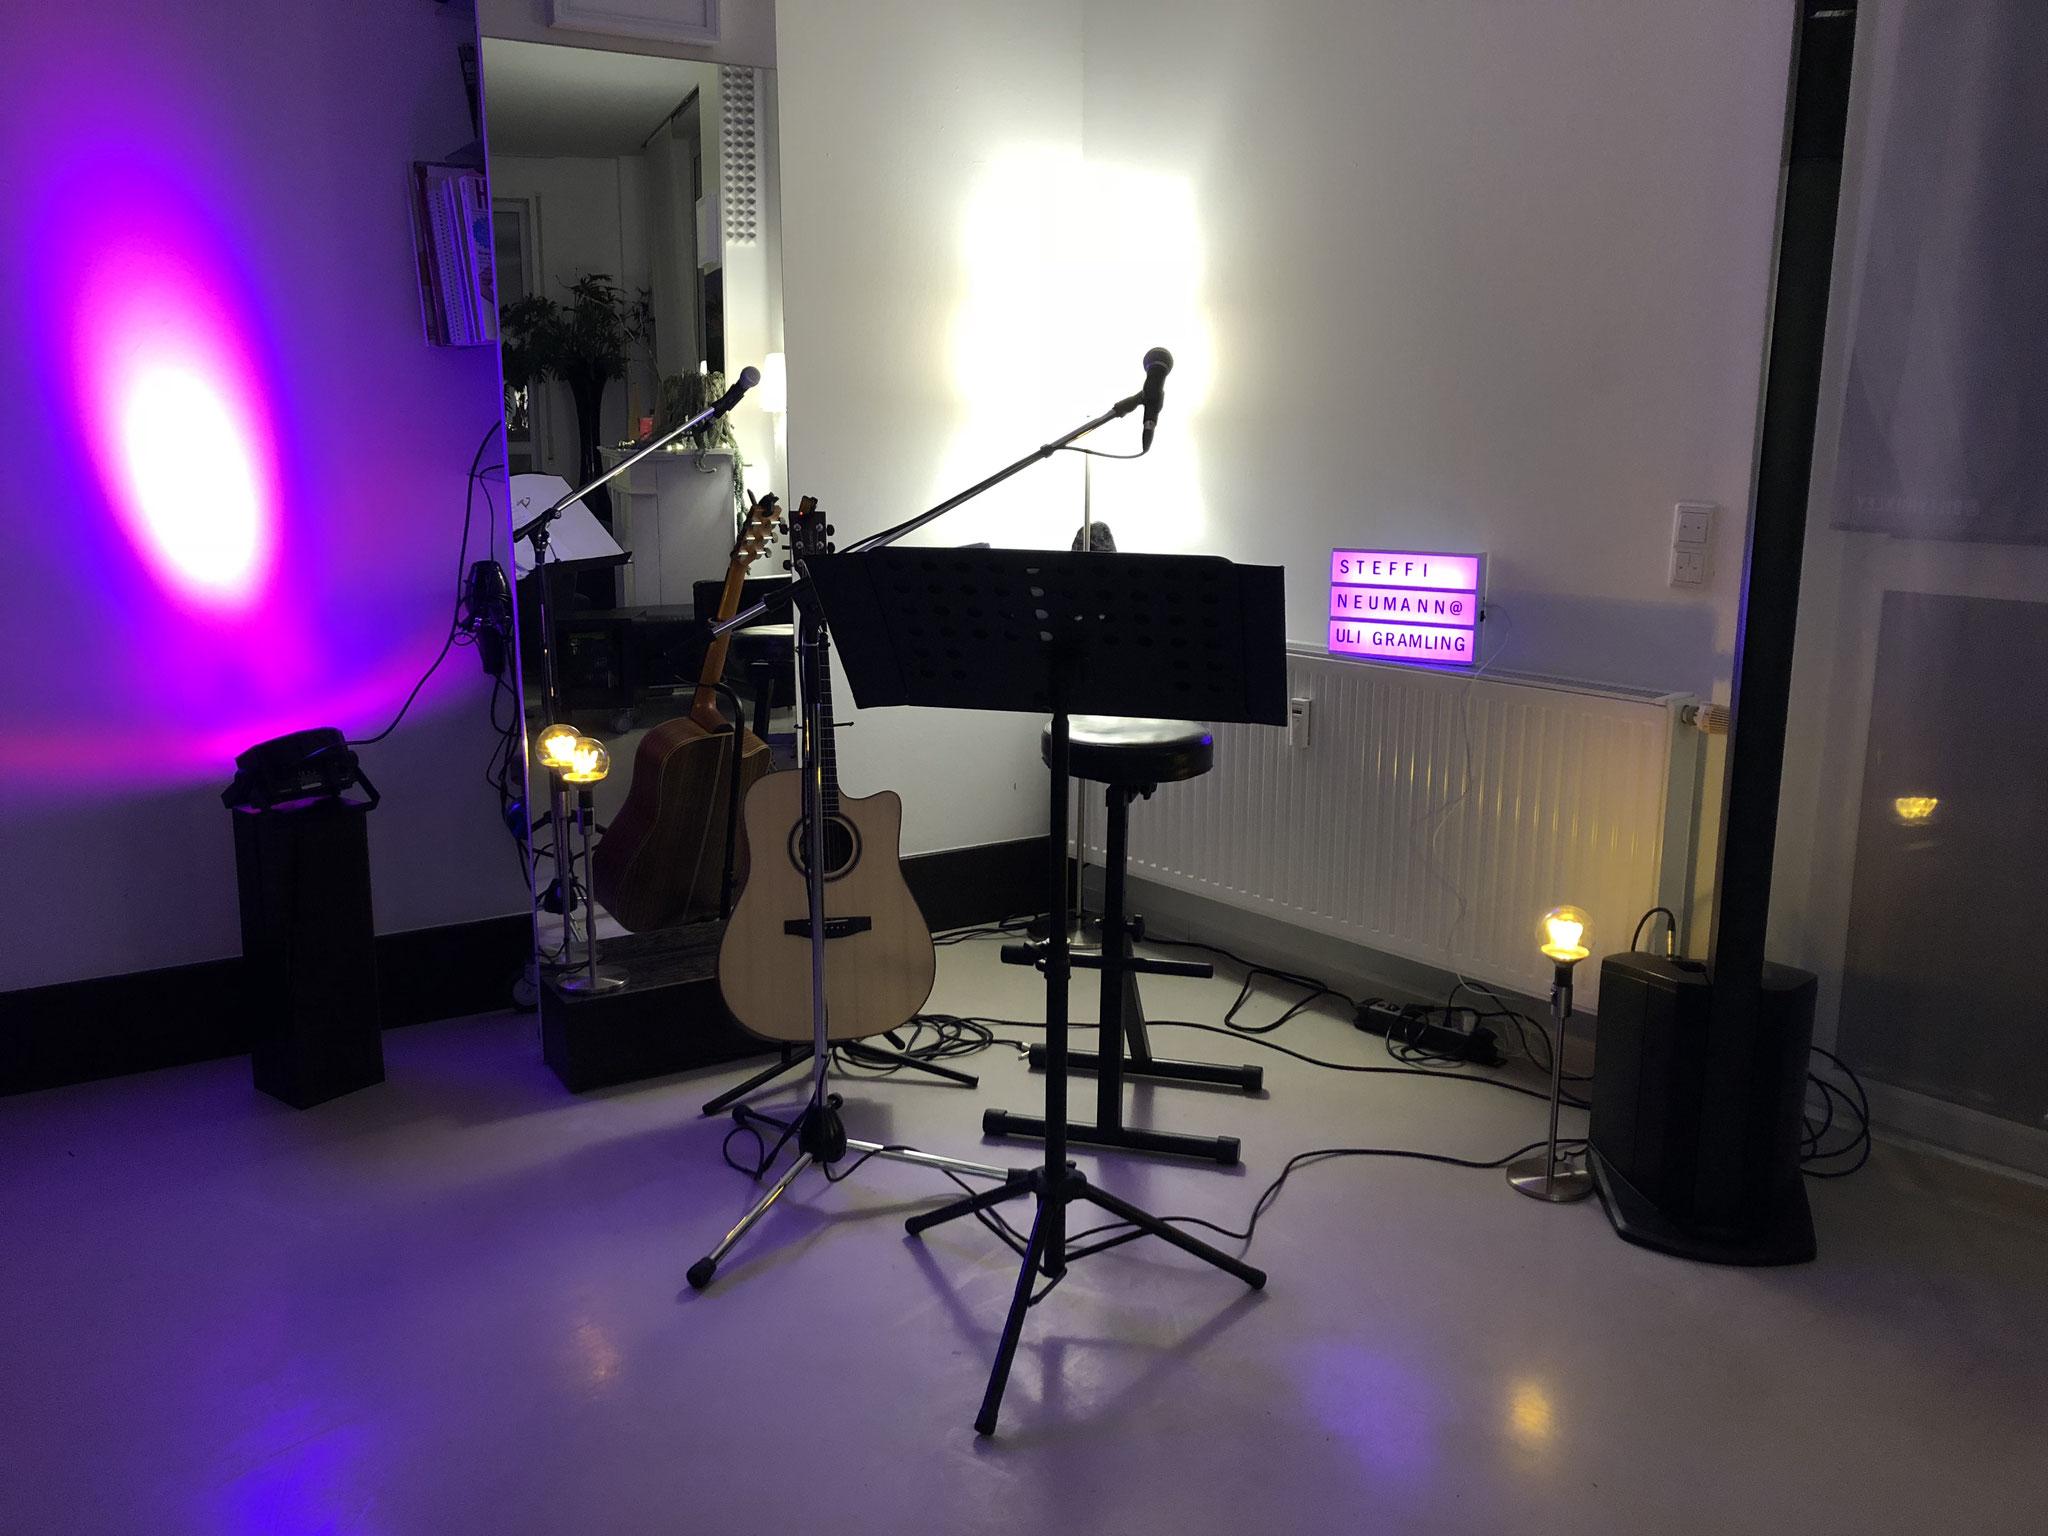 Konzert im Frisörsalon #UliGramling in Mundelsheim